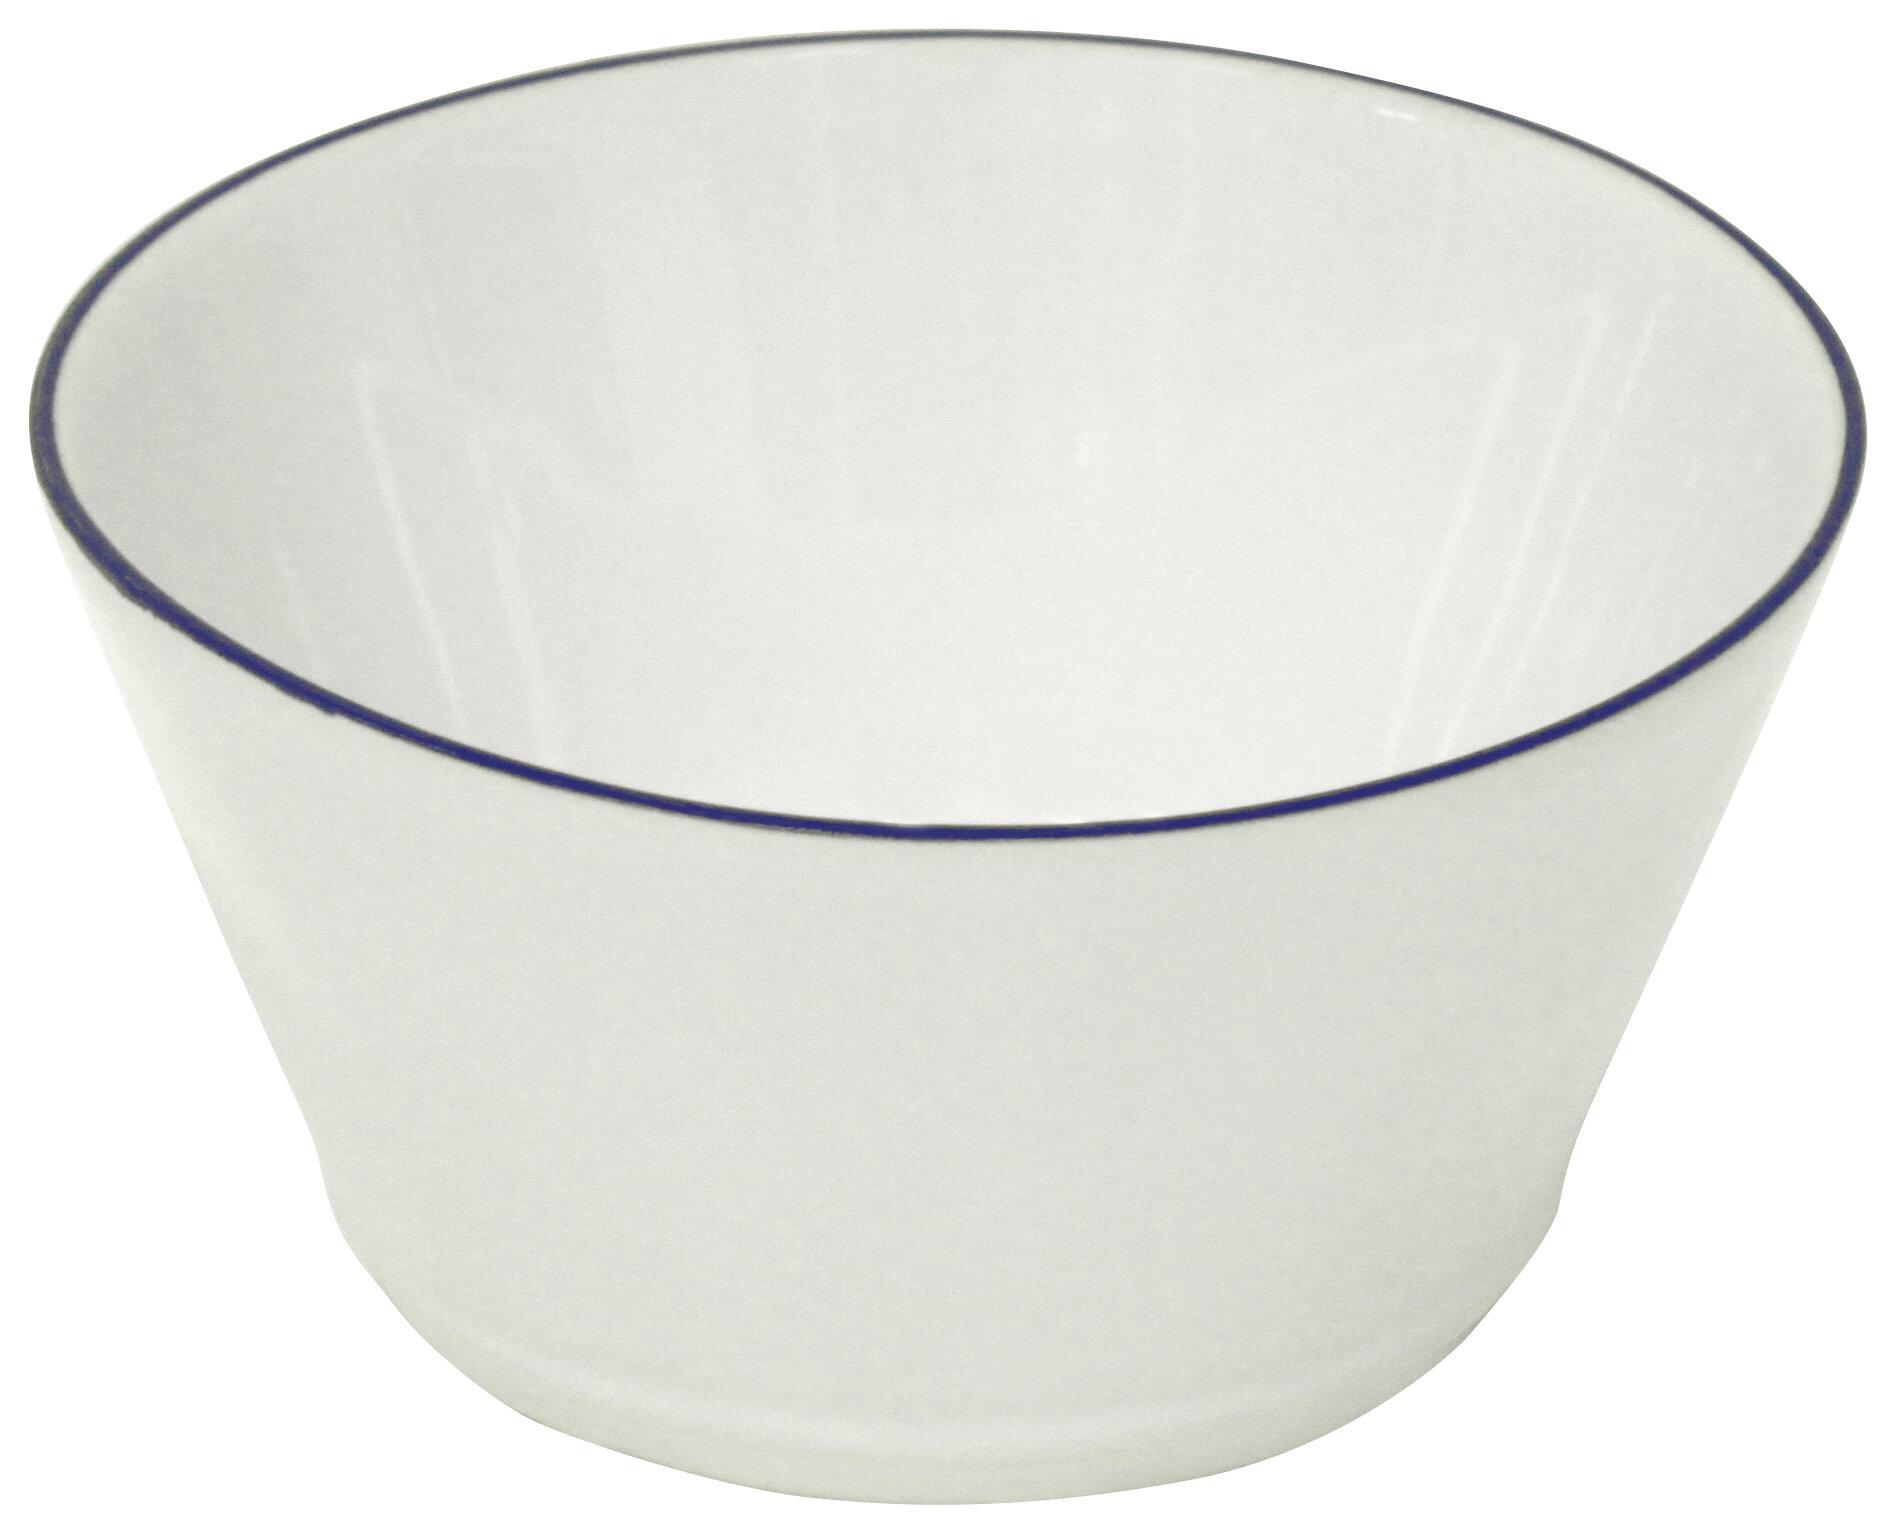 Costa Nova Beja 15 Oz Cereal Bowl Wayfair